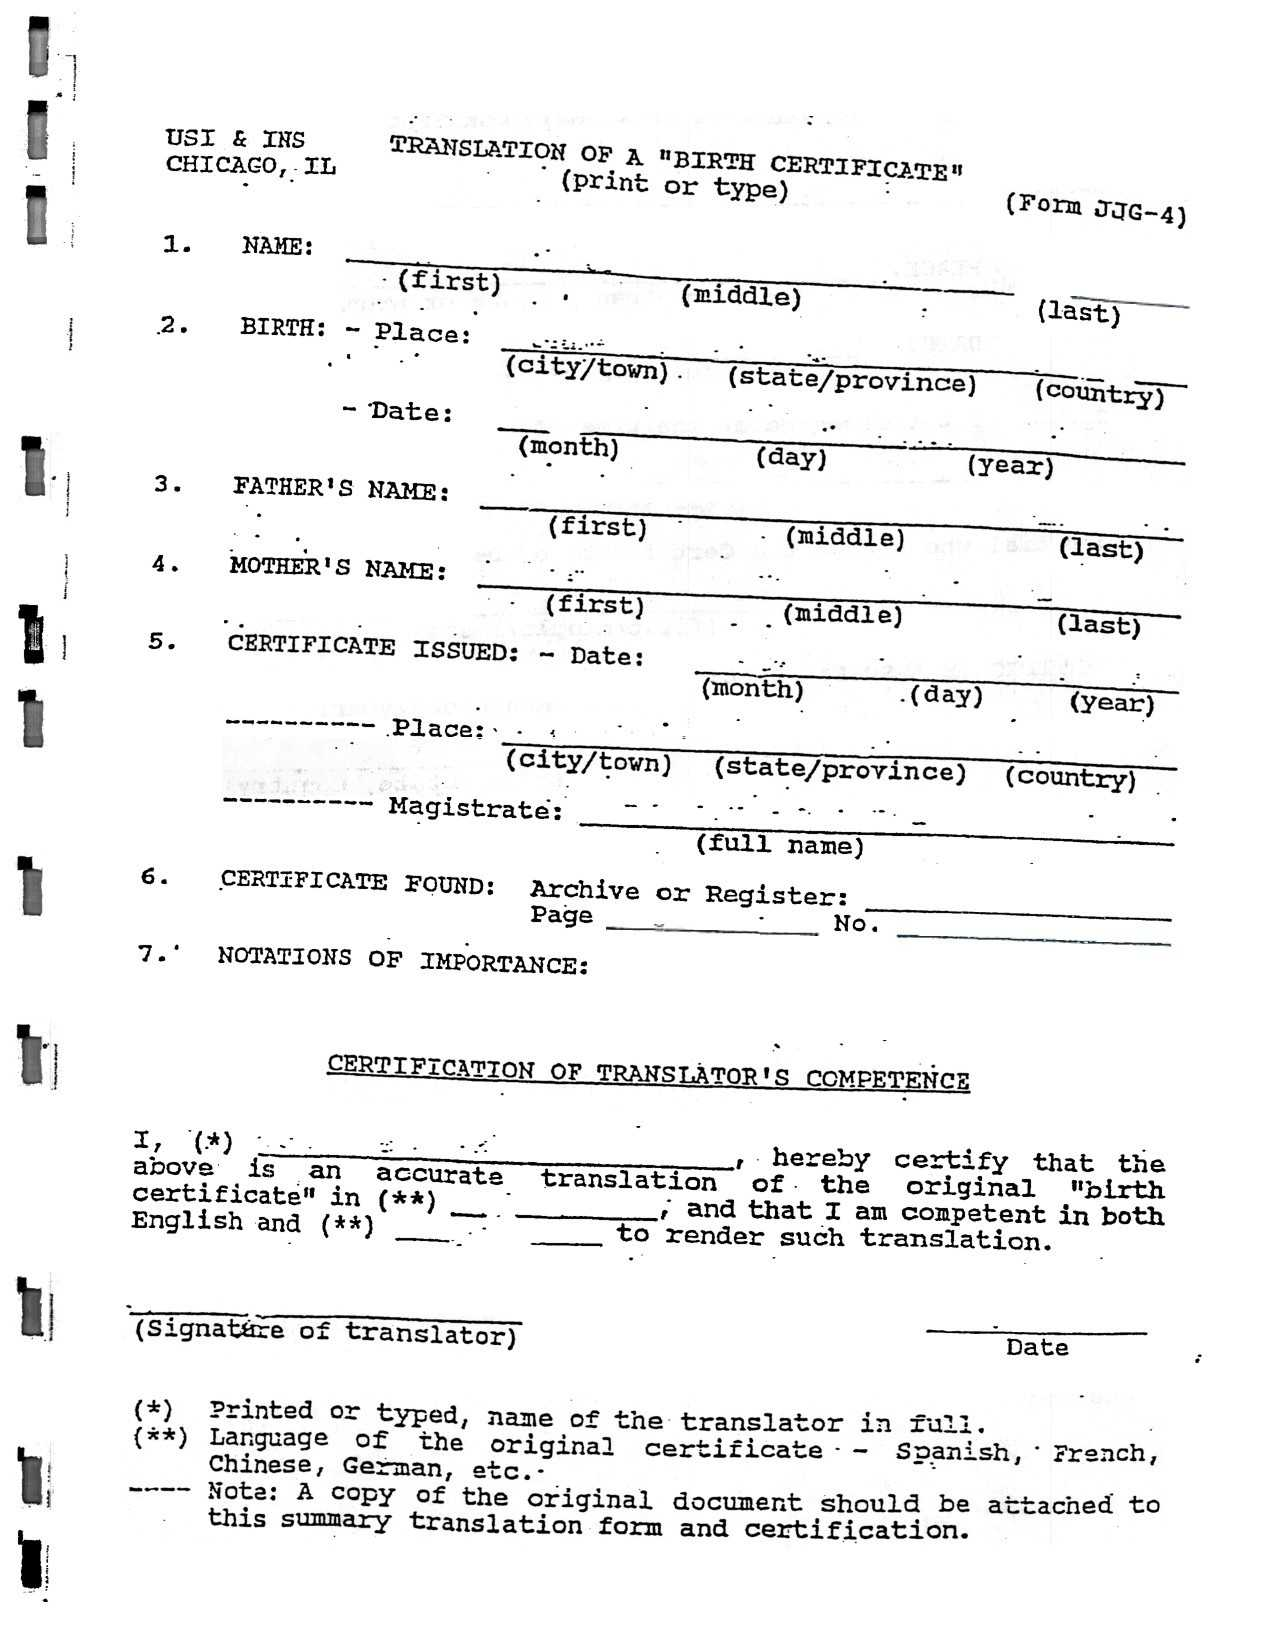 Death Certificate Translation Template Spanish To English Regarding Death Certificate Translation Template